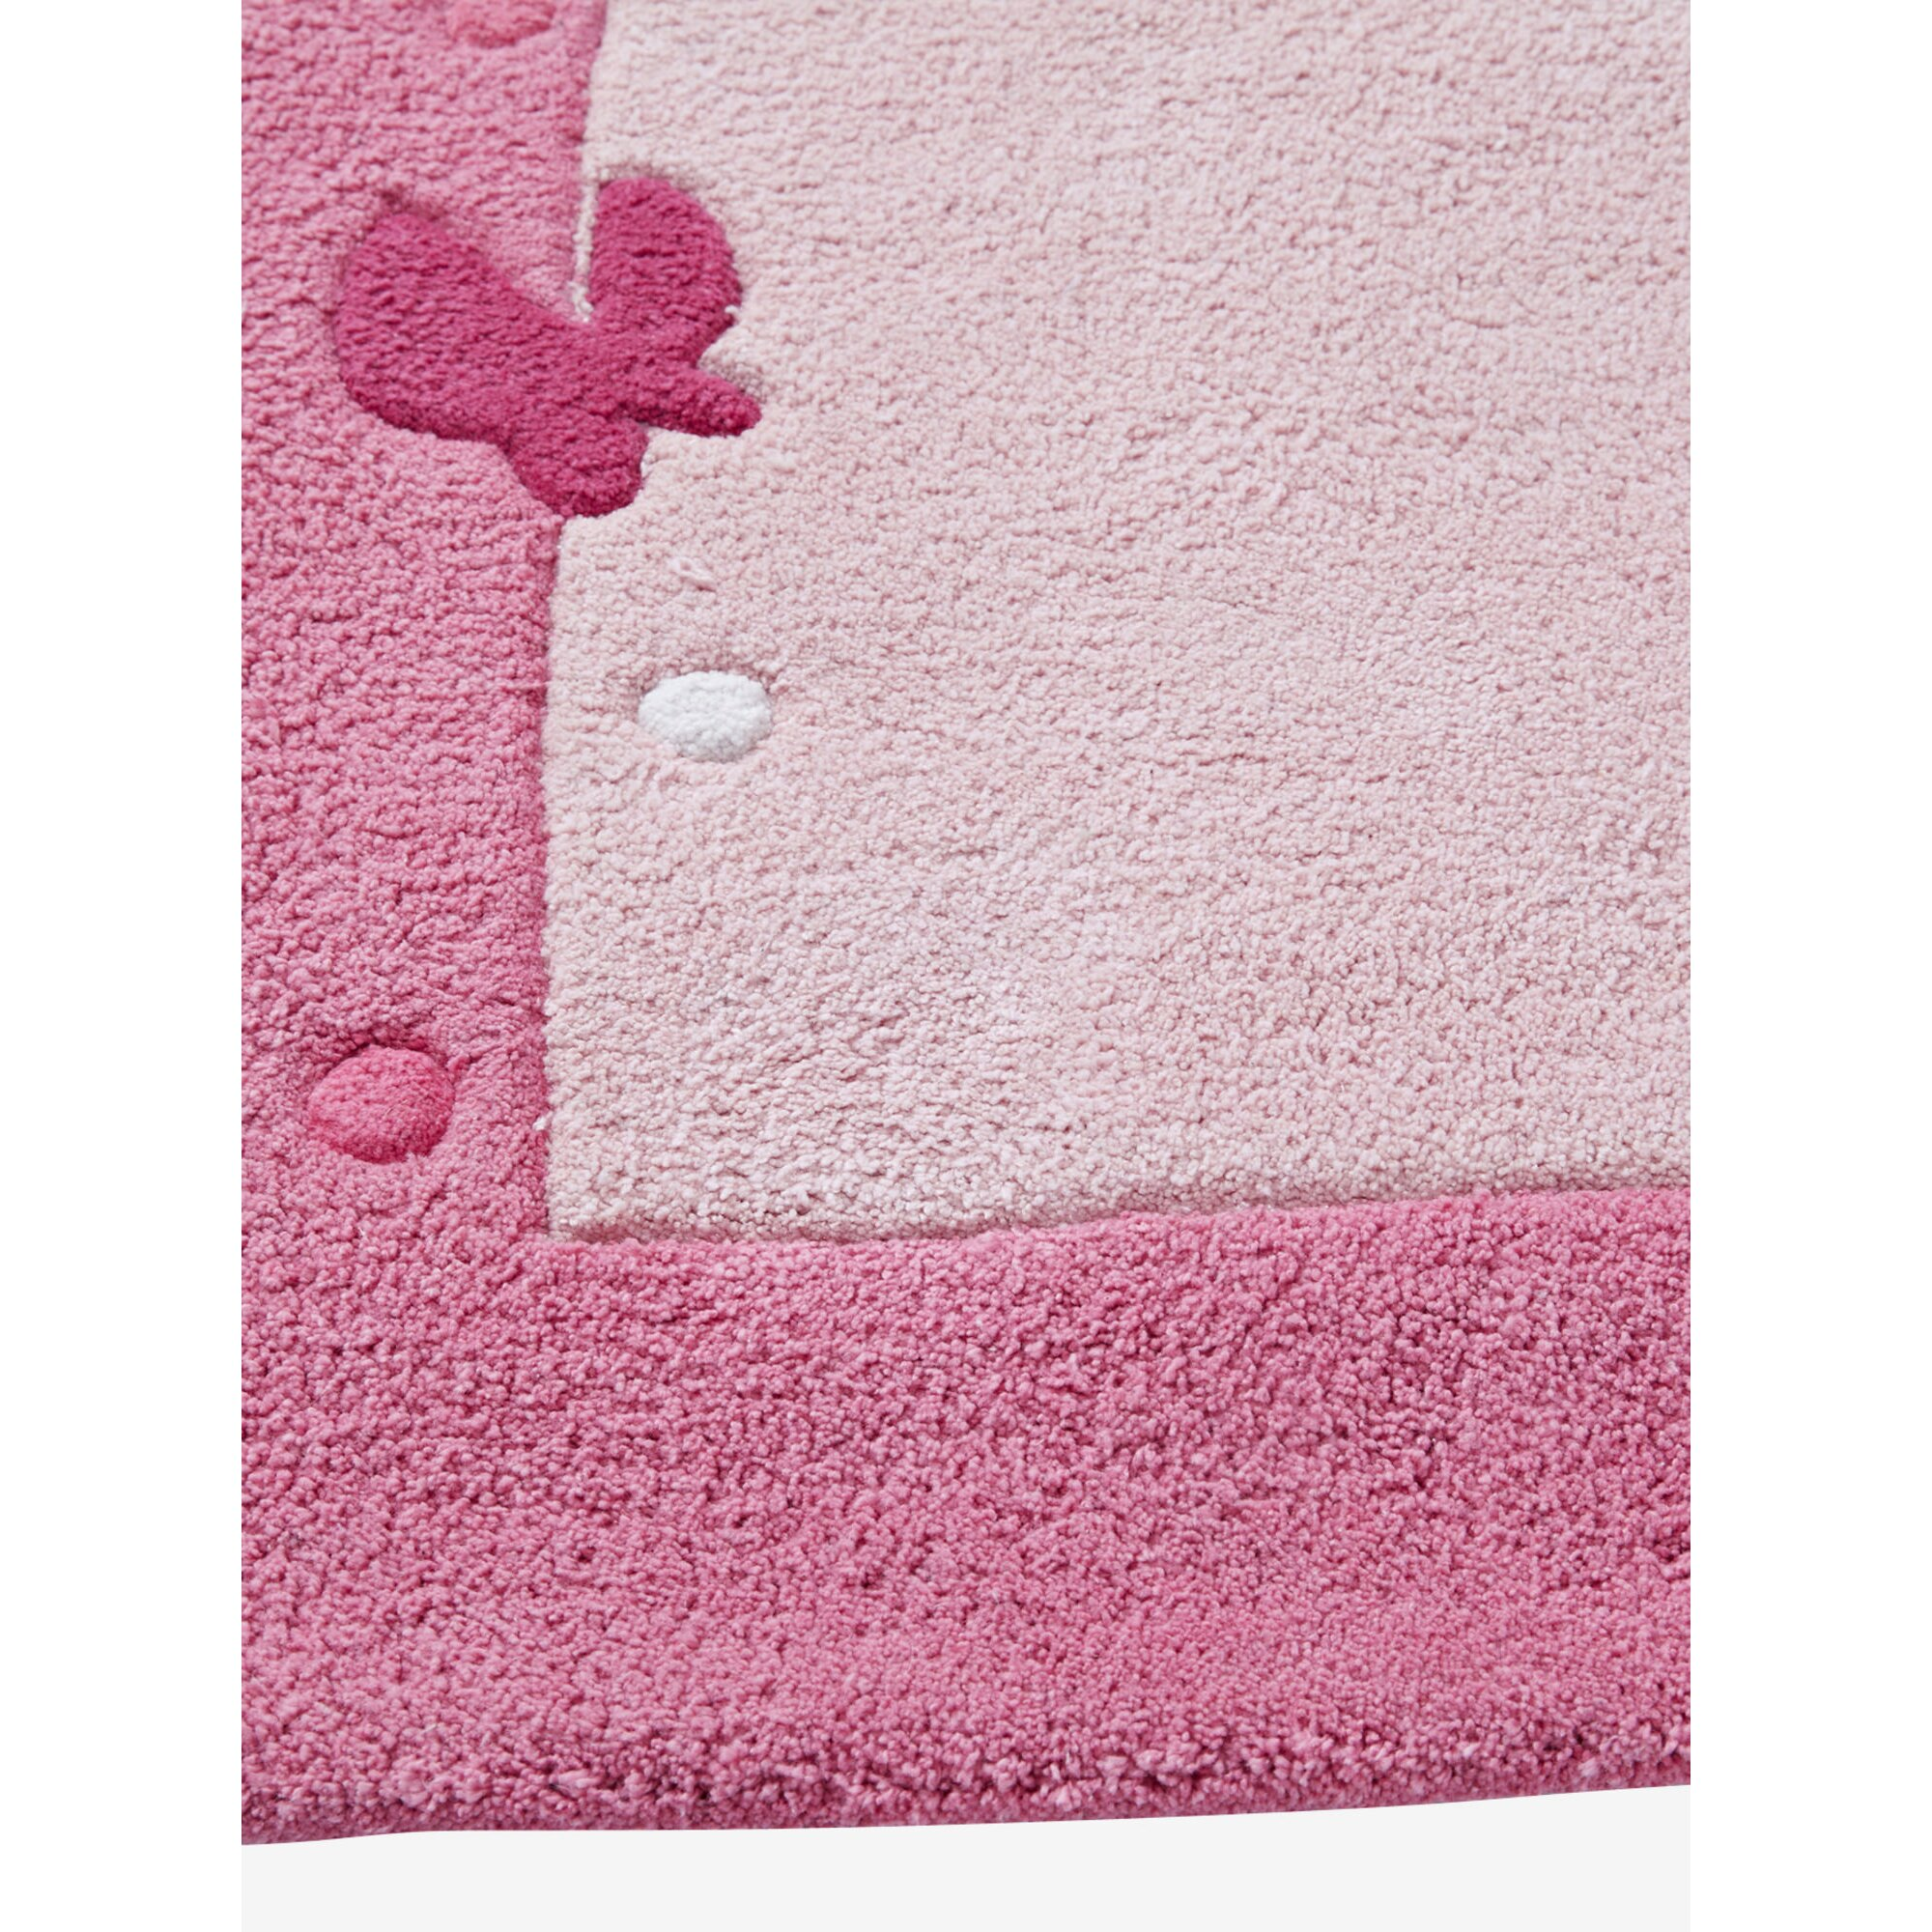 vertbaudet-kinderzimmer-teppich-schmetterlinge-rosa